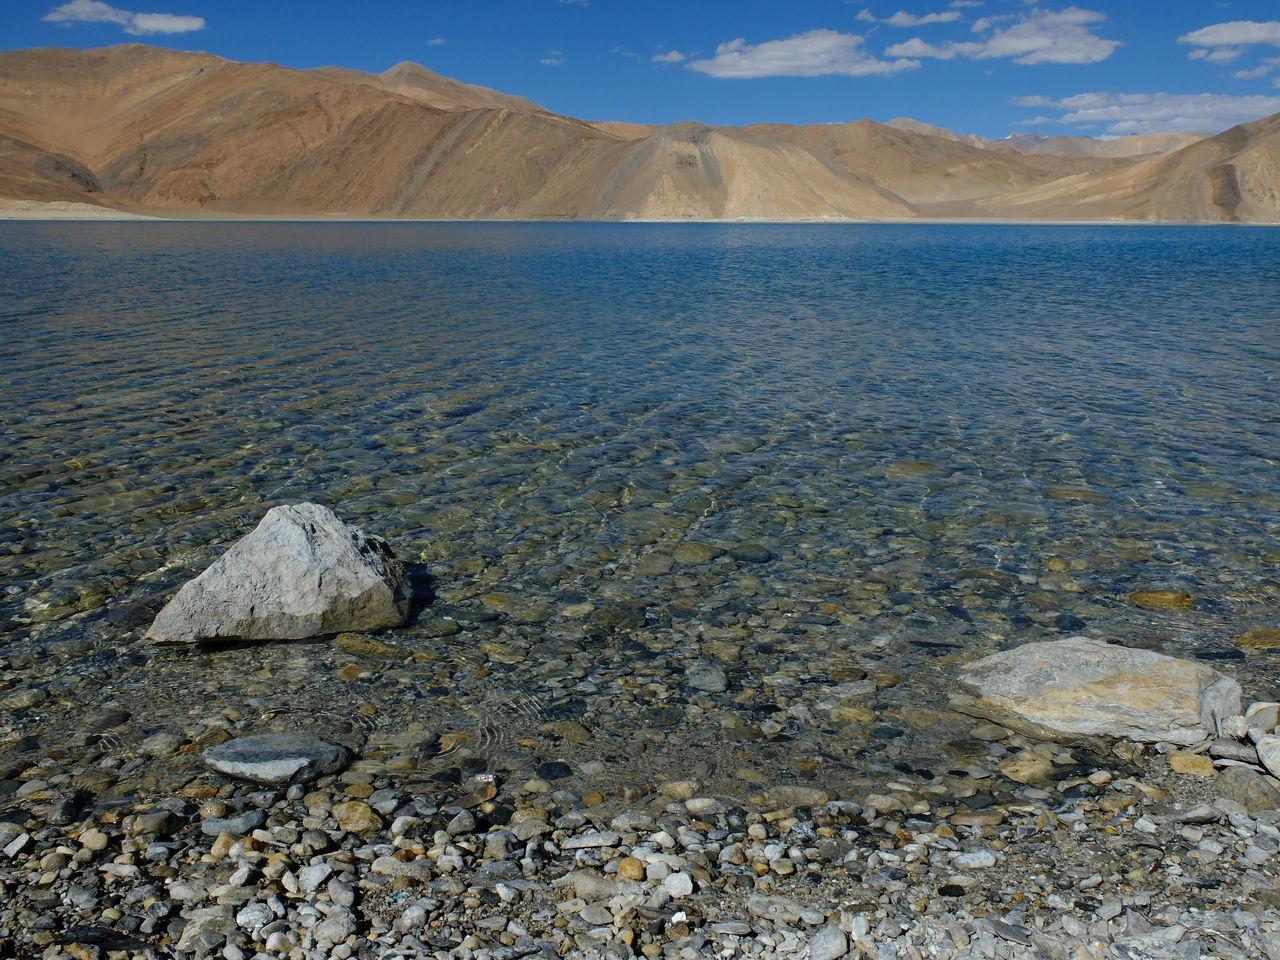 Day Extreme Terrain Jammu And Kashmir Landscape Leh Ladakh Mountain Nature No People Outdoors Pangong Lake Pangong Tso PangongTso The Natural World Wilderness